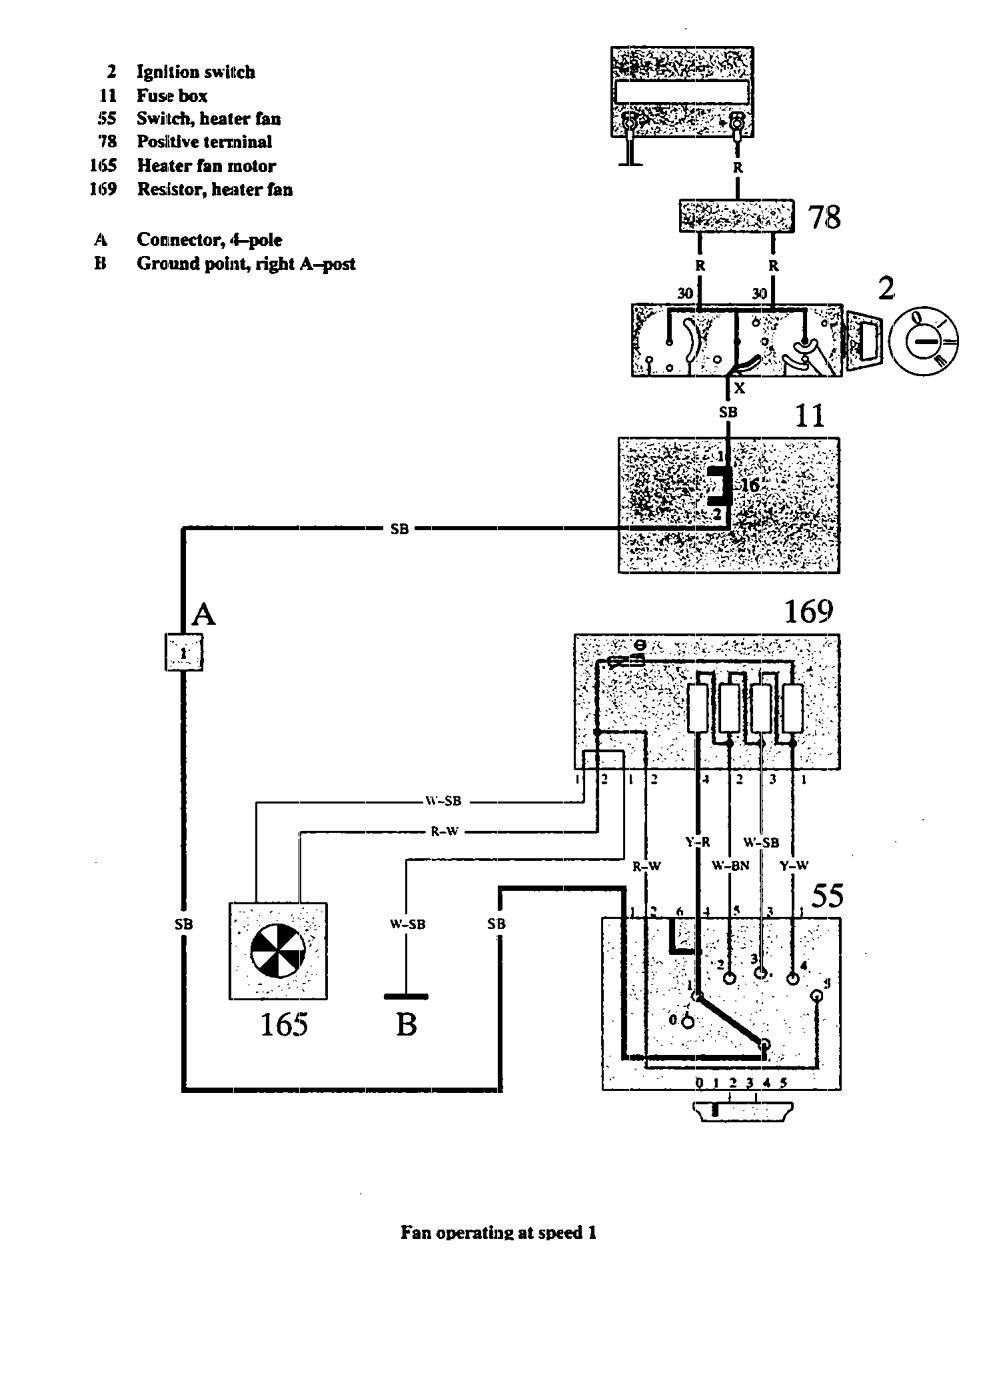 hight resolution of saab heater wiring diagram 1991 saab auto parts catalog saab 9 3 stereo wiring diagram saab wiring harness